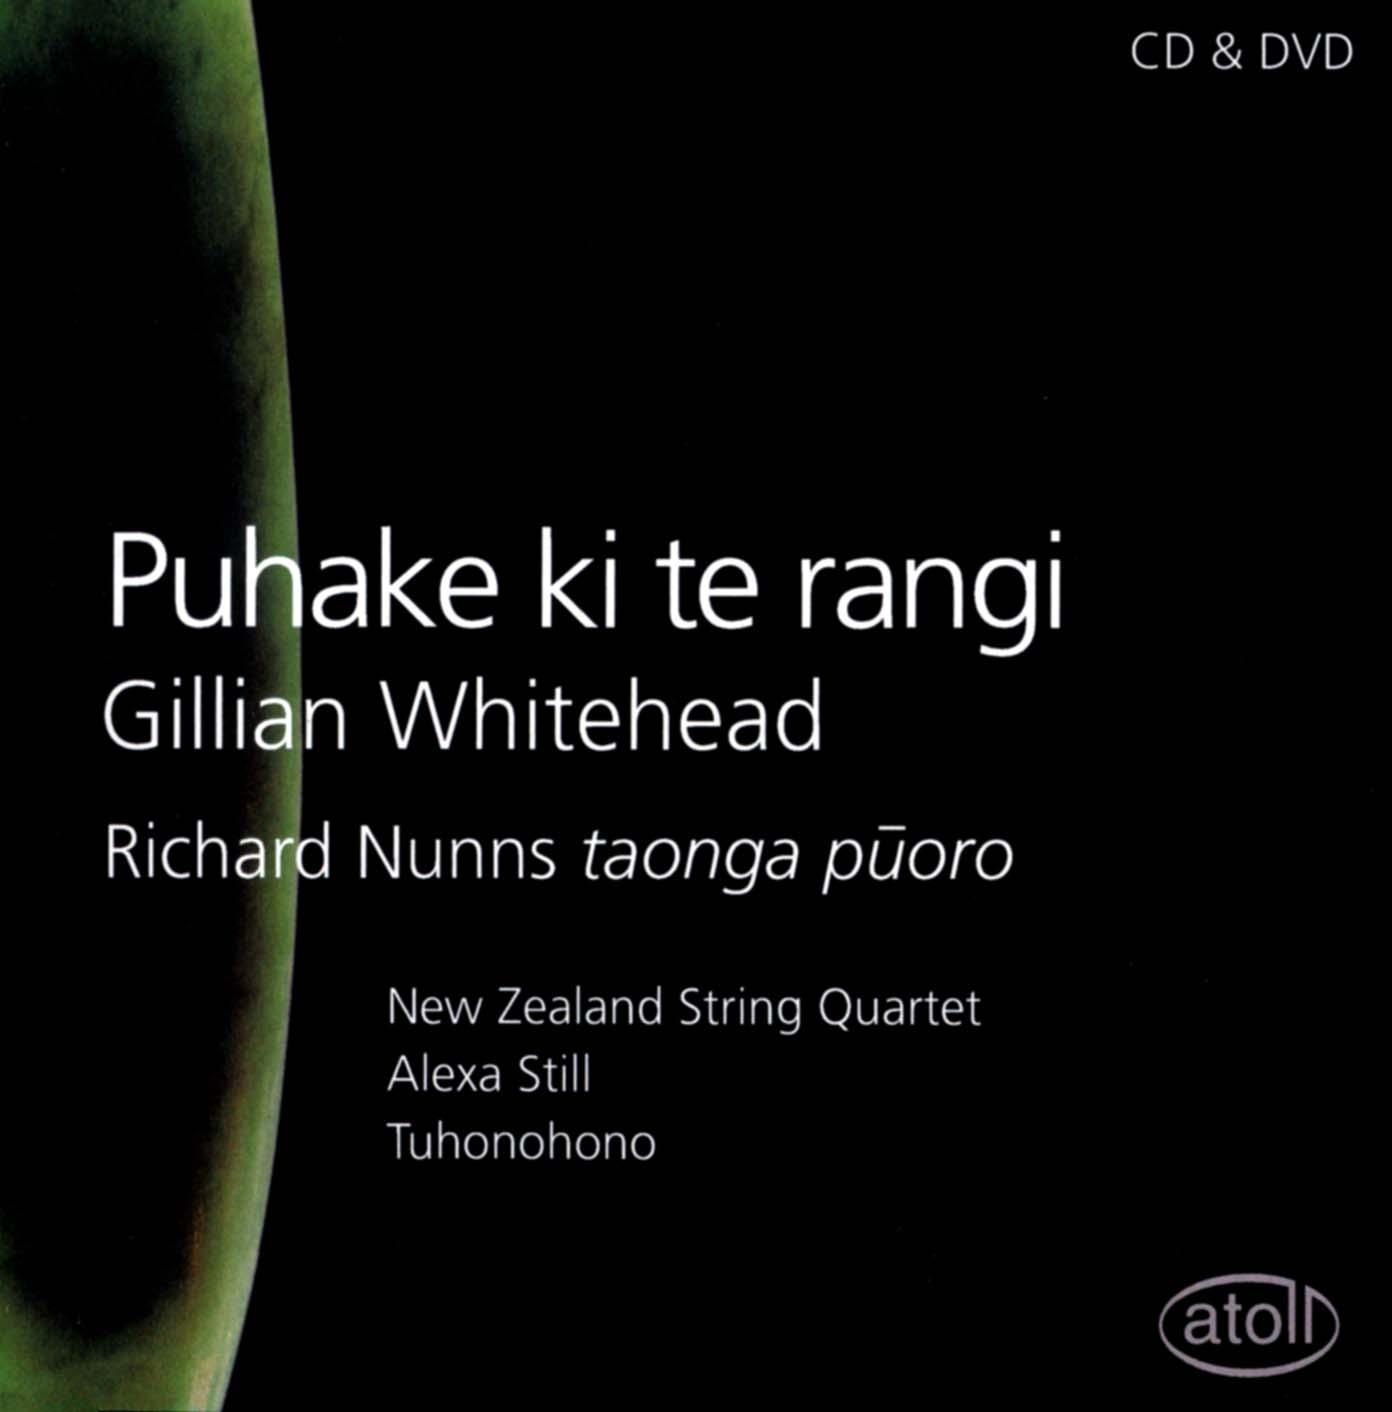 Richard Nunns and the New Zealand String Quartet: Puhake Ki Te Rangi - Session Performance